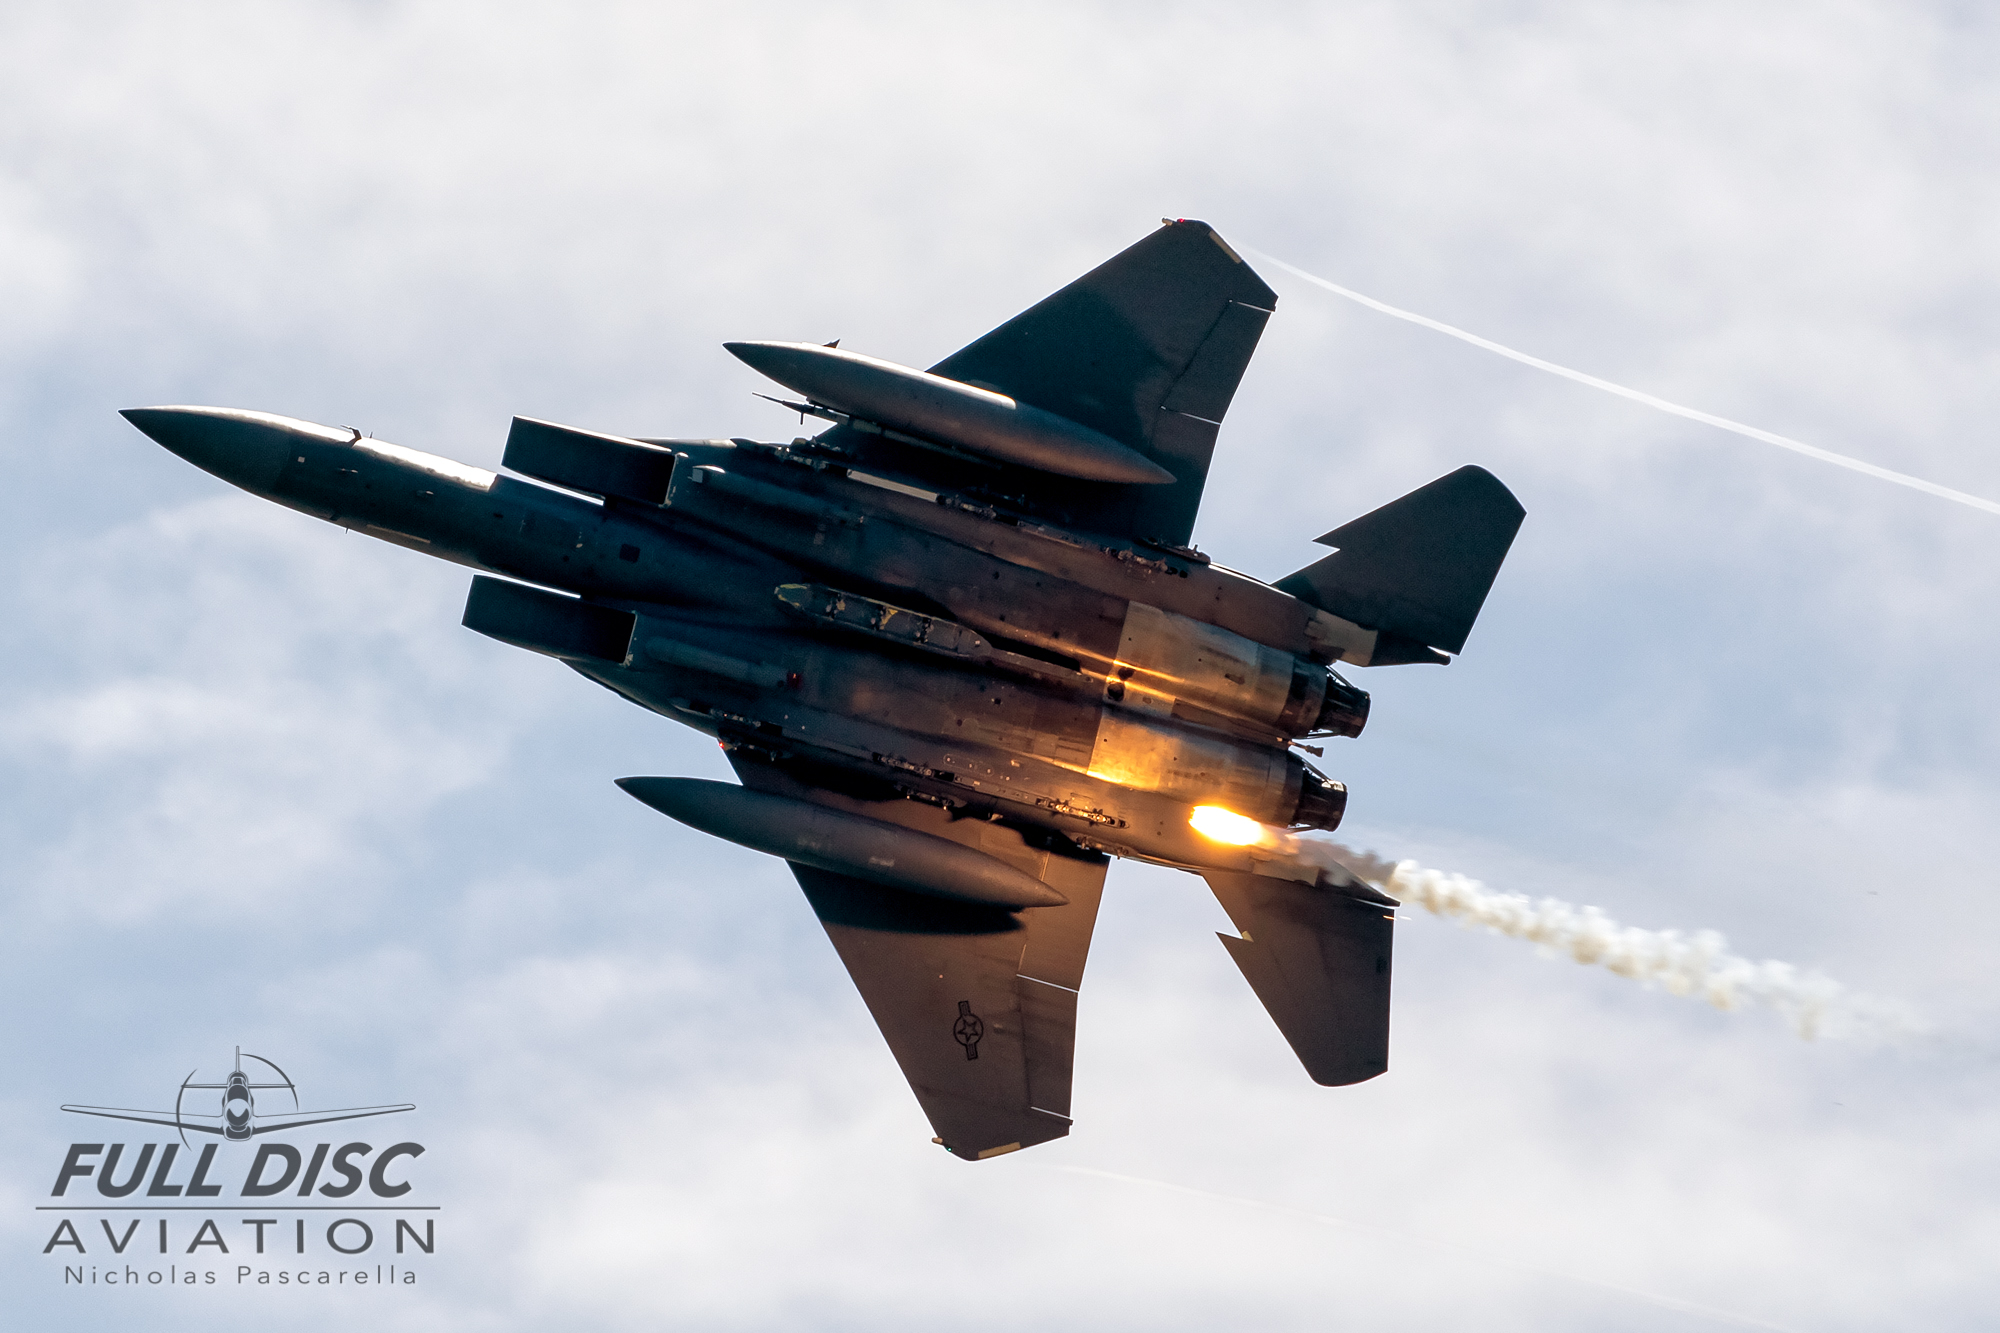 nickpascarella_nicholaspascarella_fulldiscaviation_aircraft_f15_flares.jpg